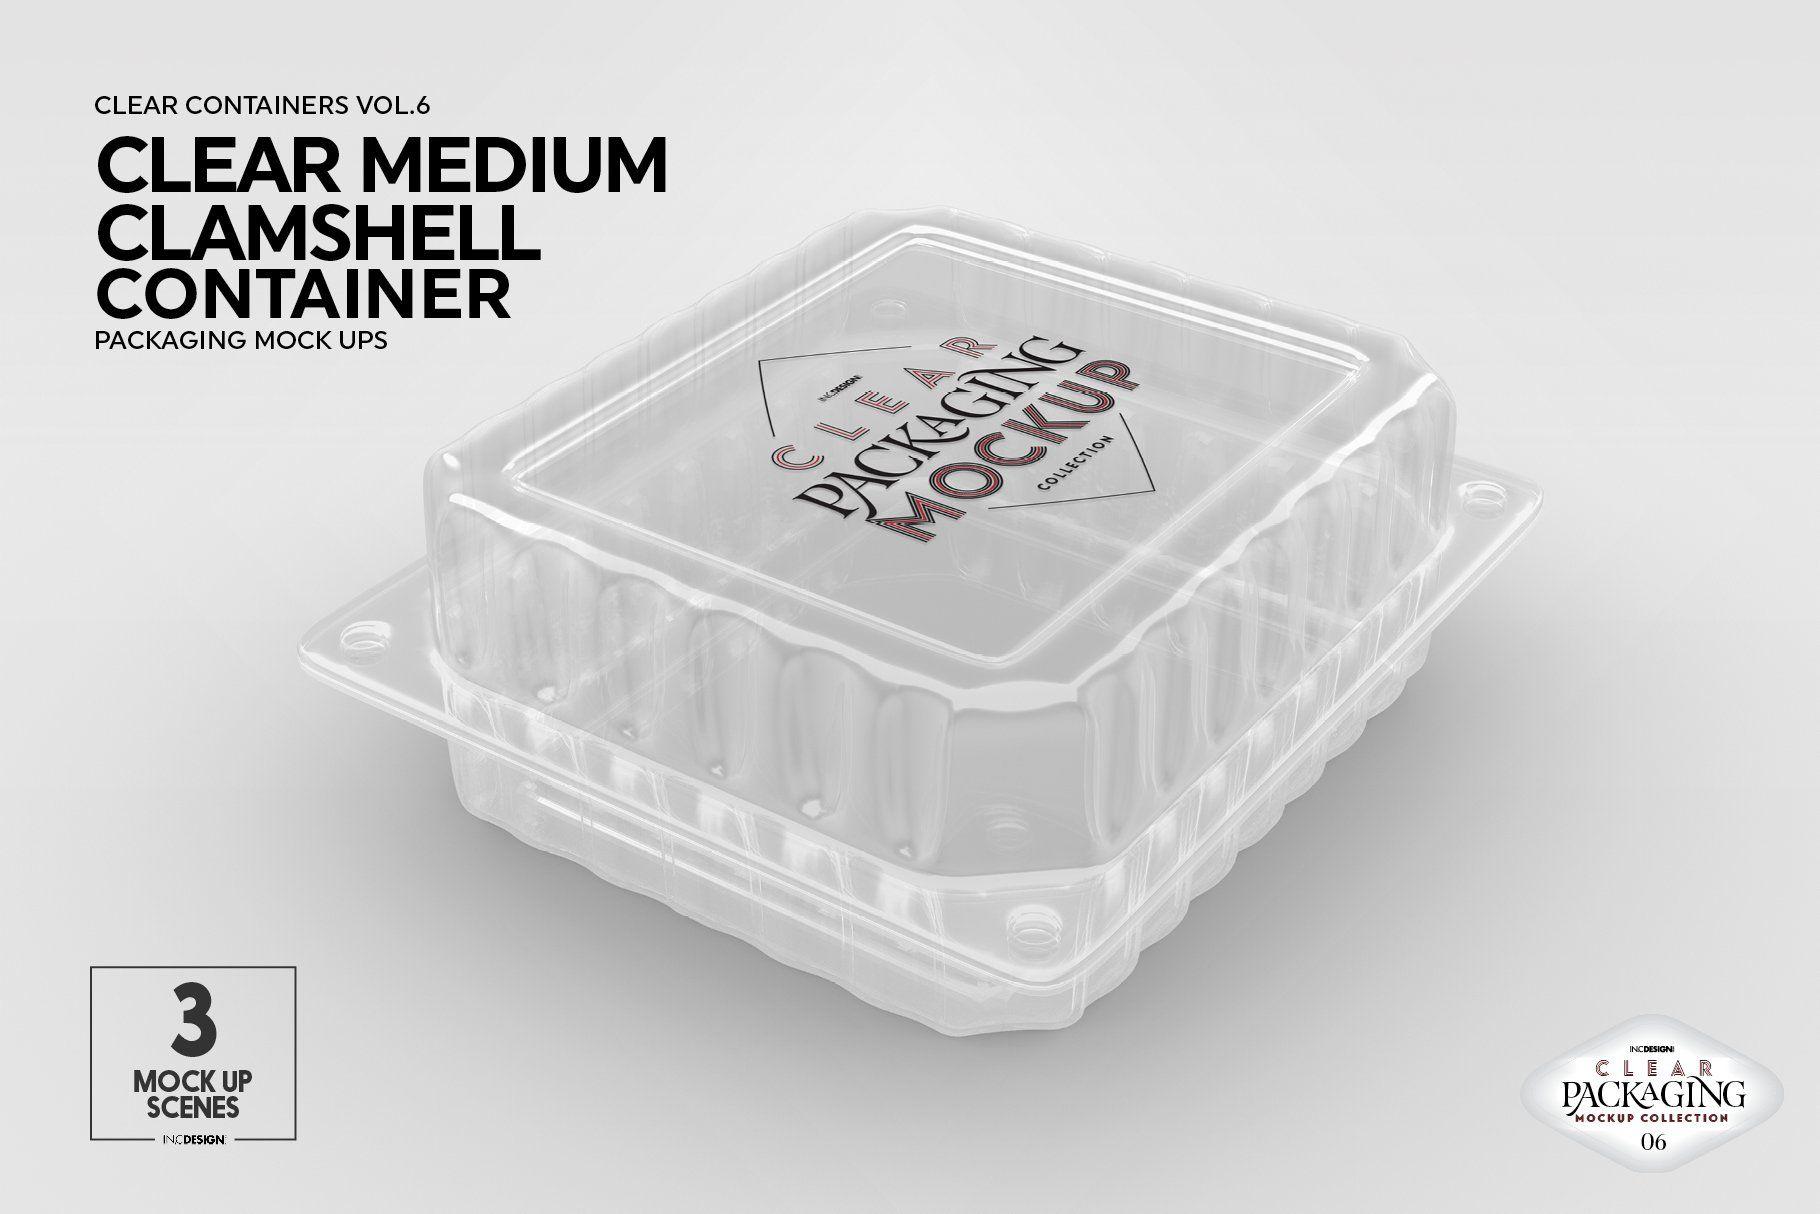 Medium Clamshell Packaging Mockup Packaging Mockup Clamshell